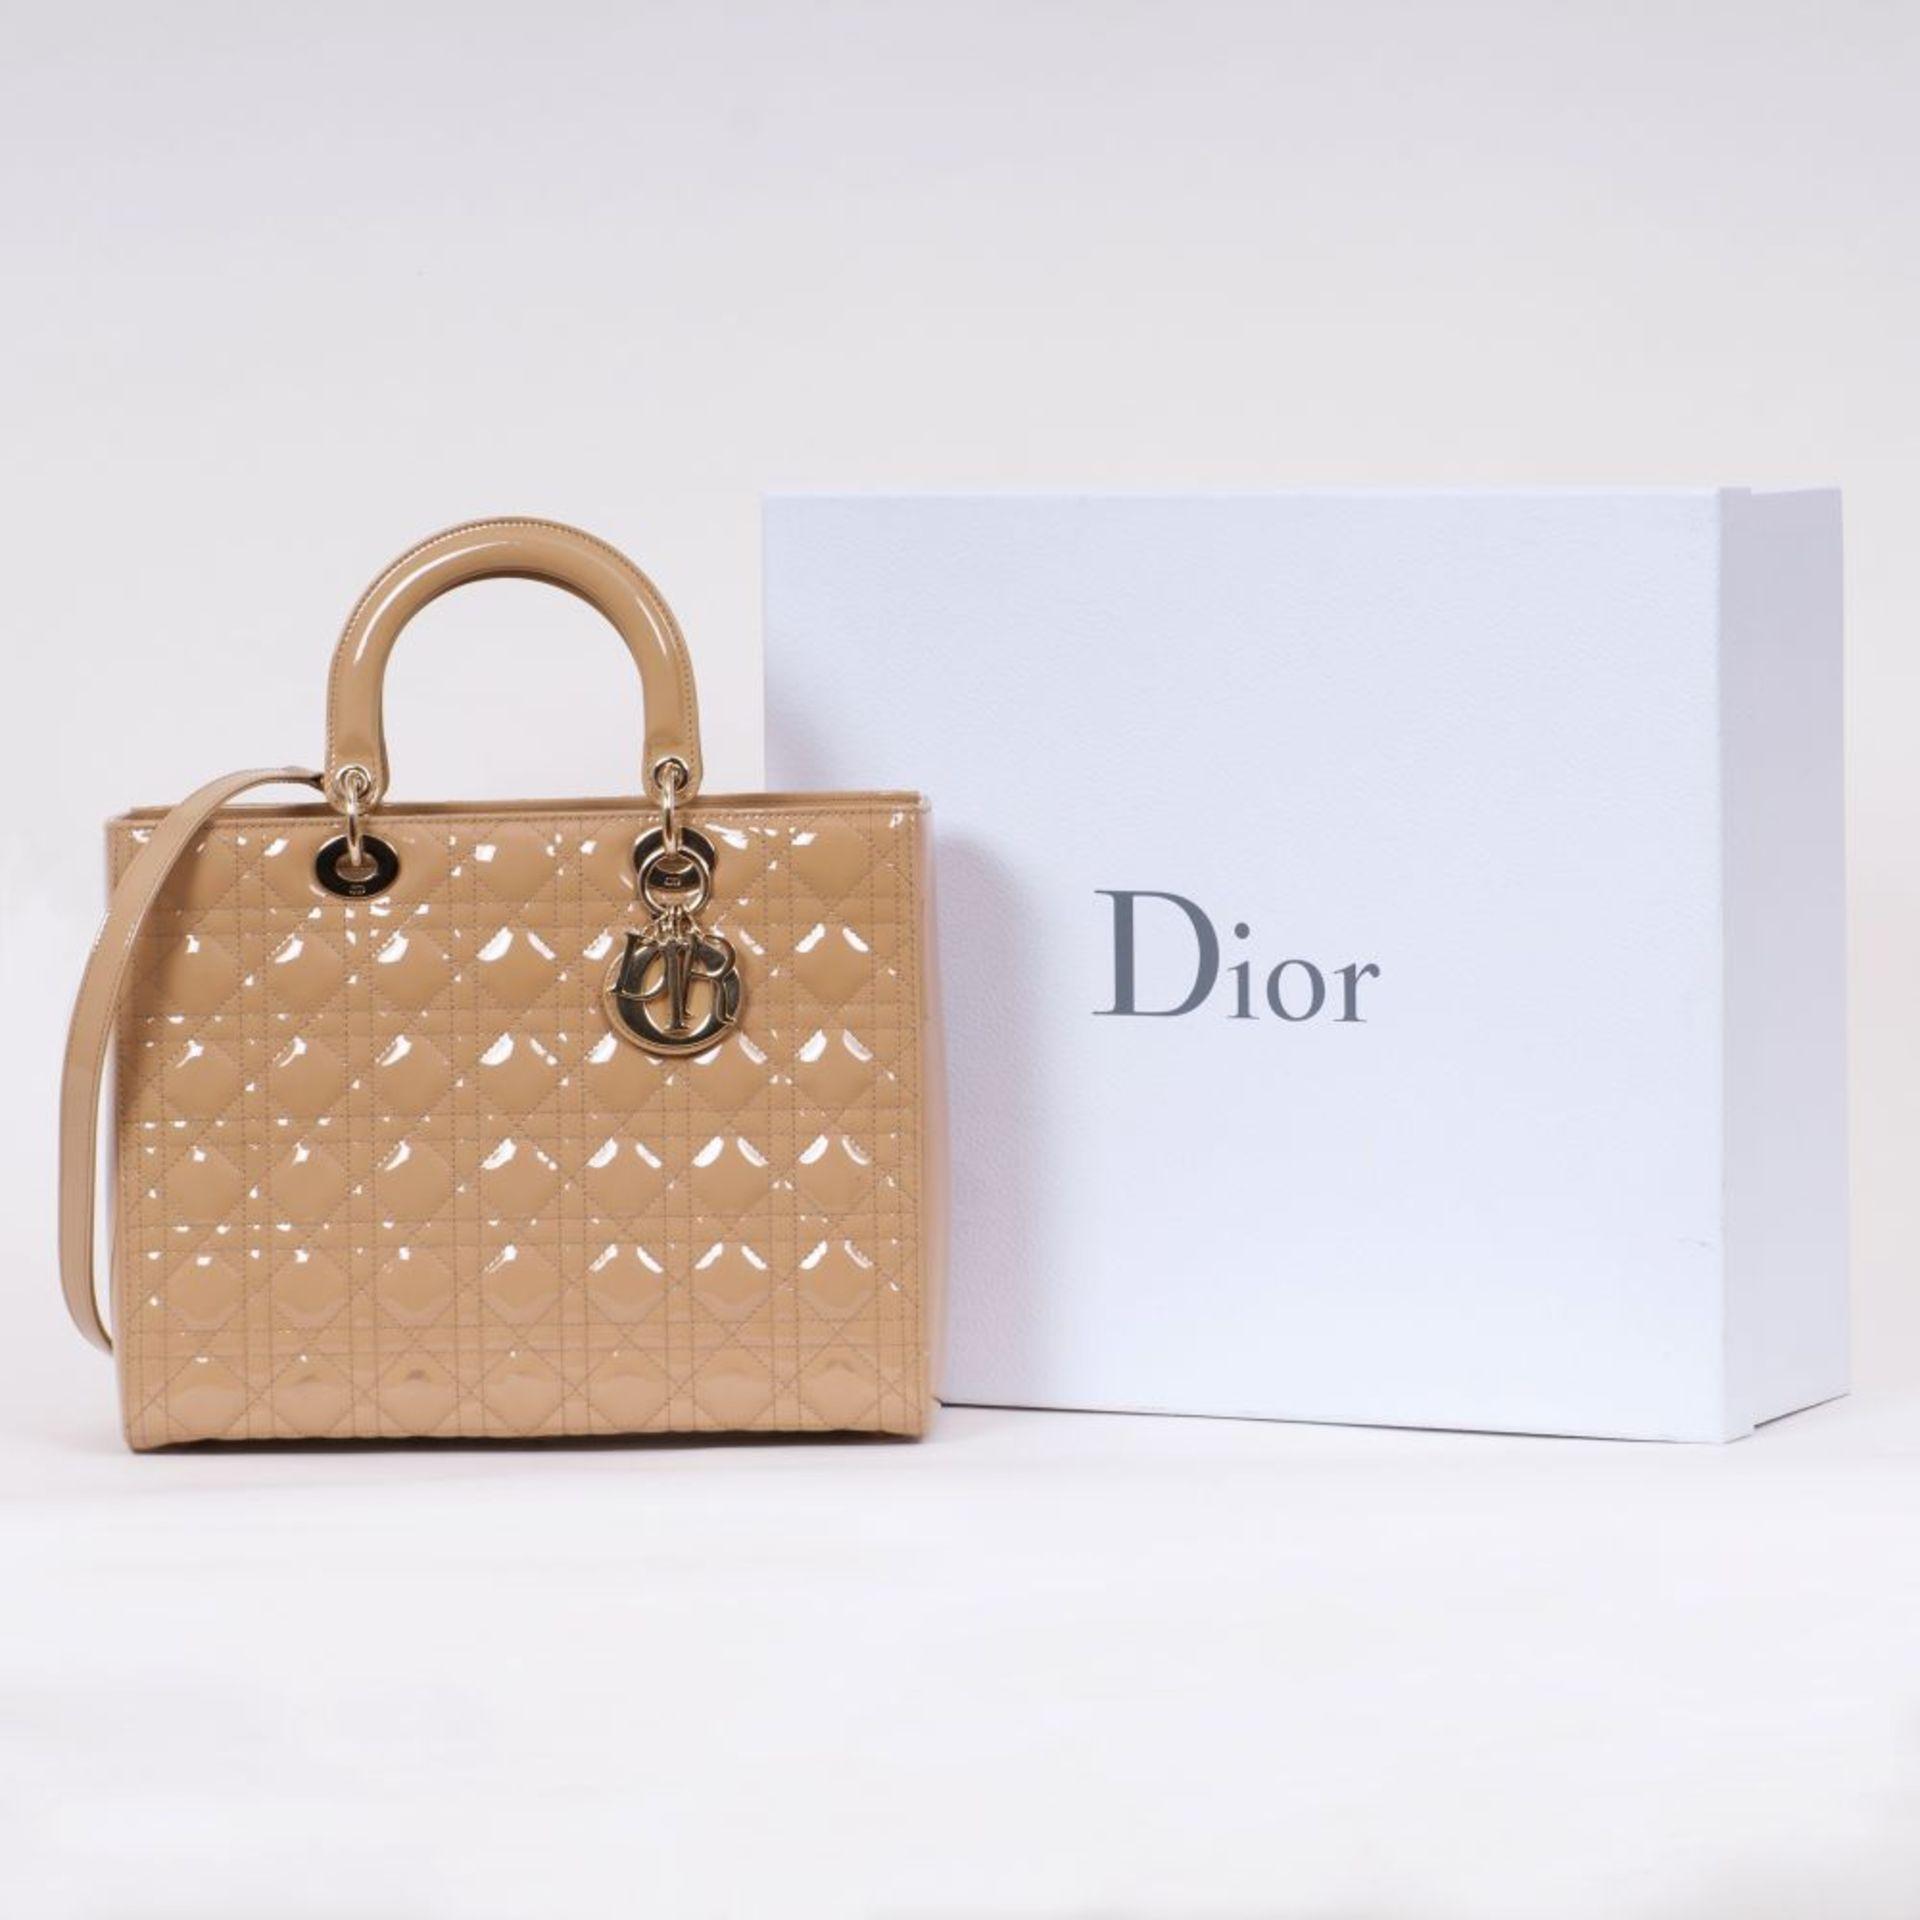 Christian Dior. Lady Dior Bag Beige. - Image 2 of 2